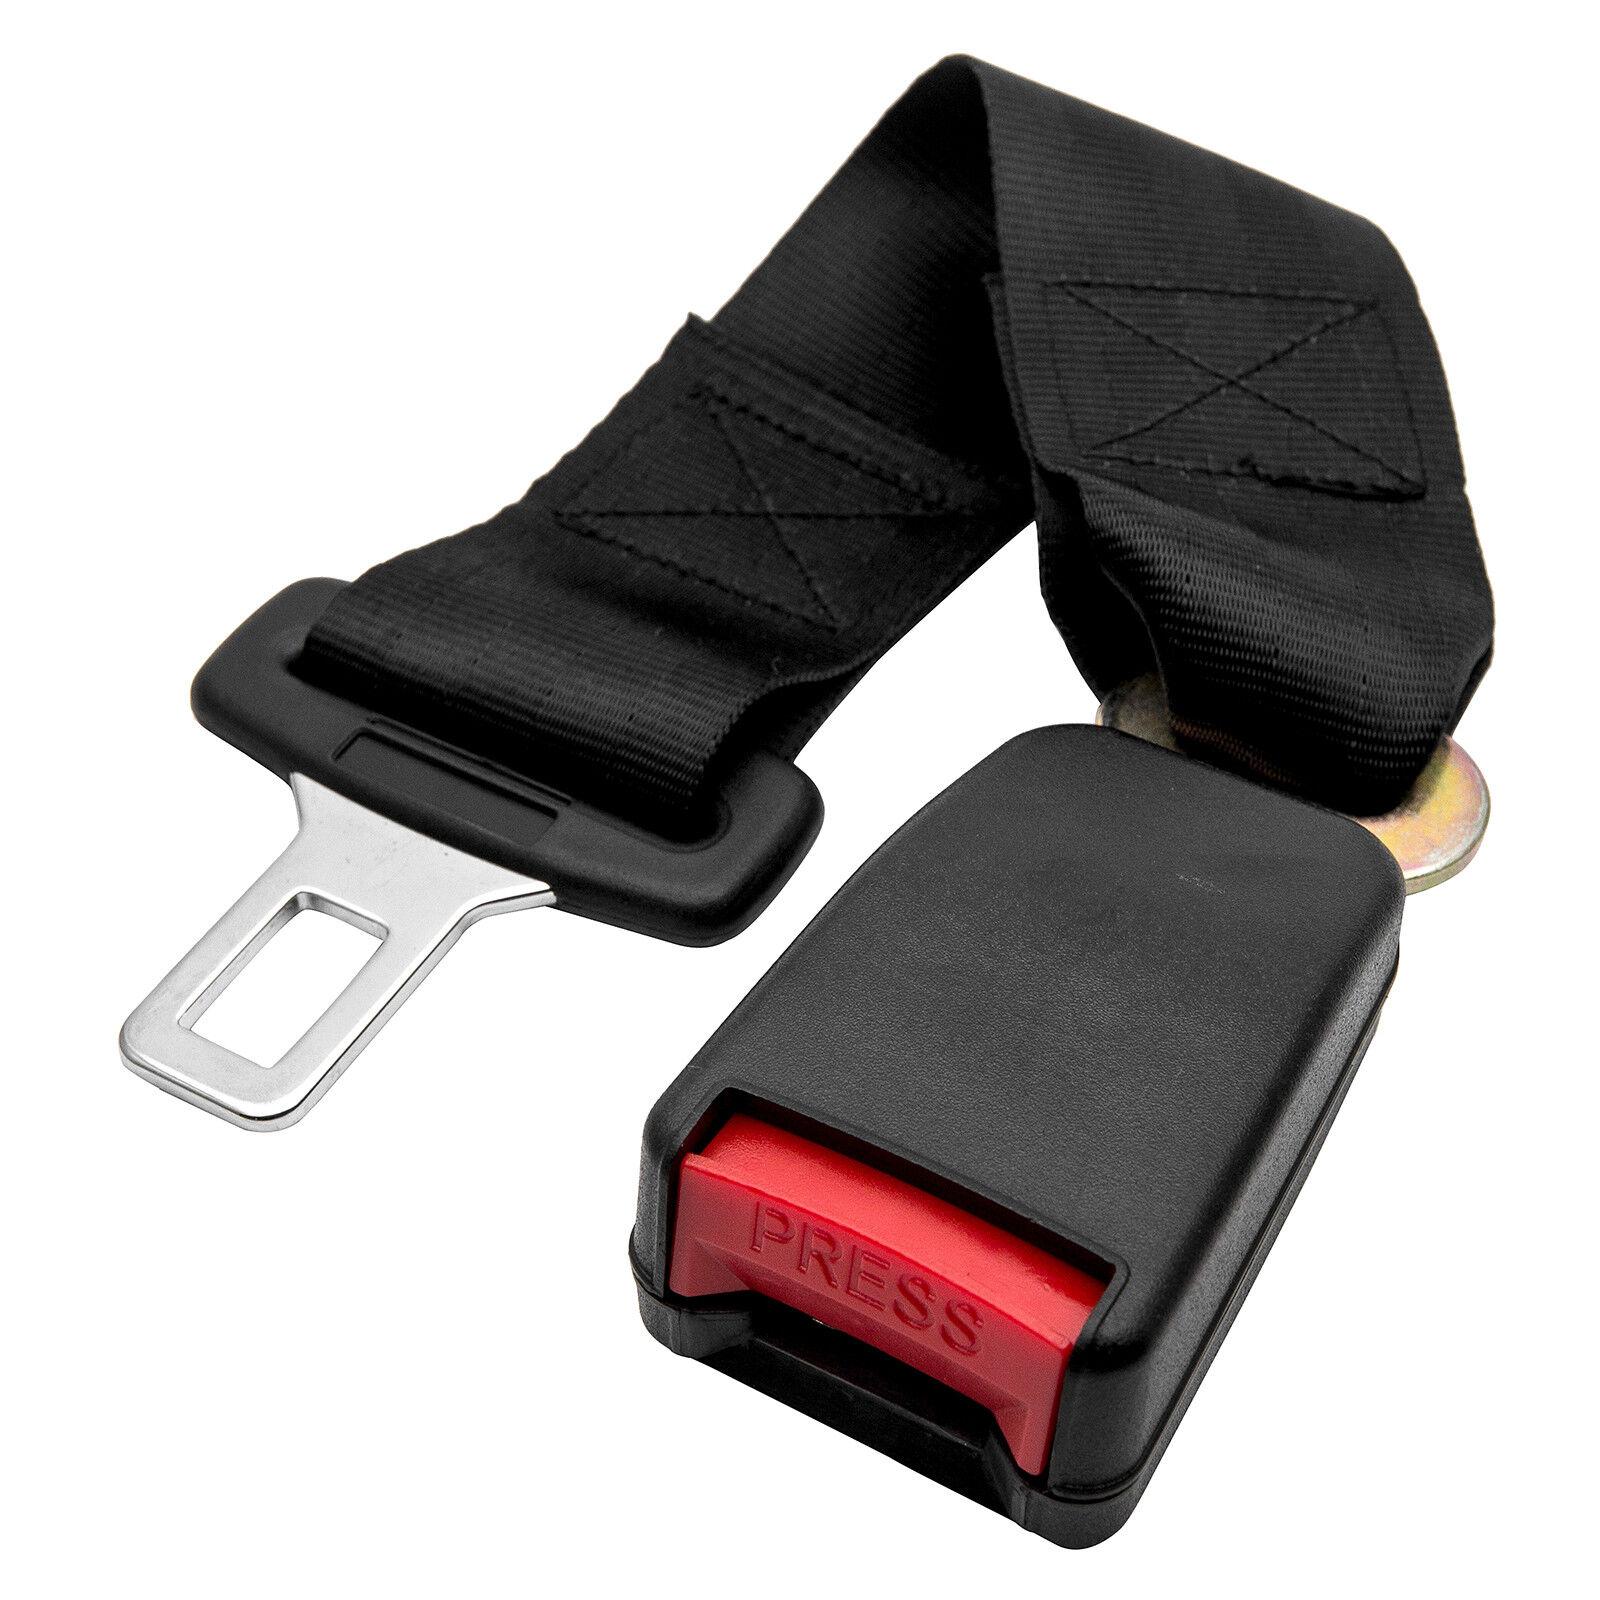 36cm neuf universel voiture auto ceinture de s curit extension extender support ebay. Black Bedroom Furniture Sets. Home Design Ideas